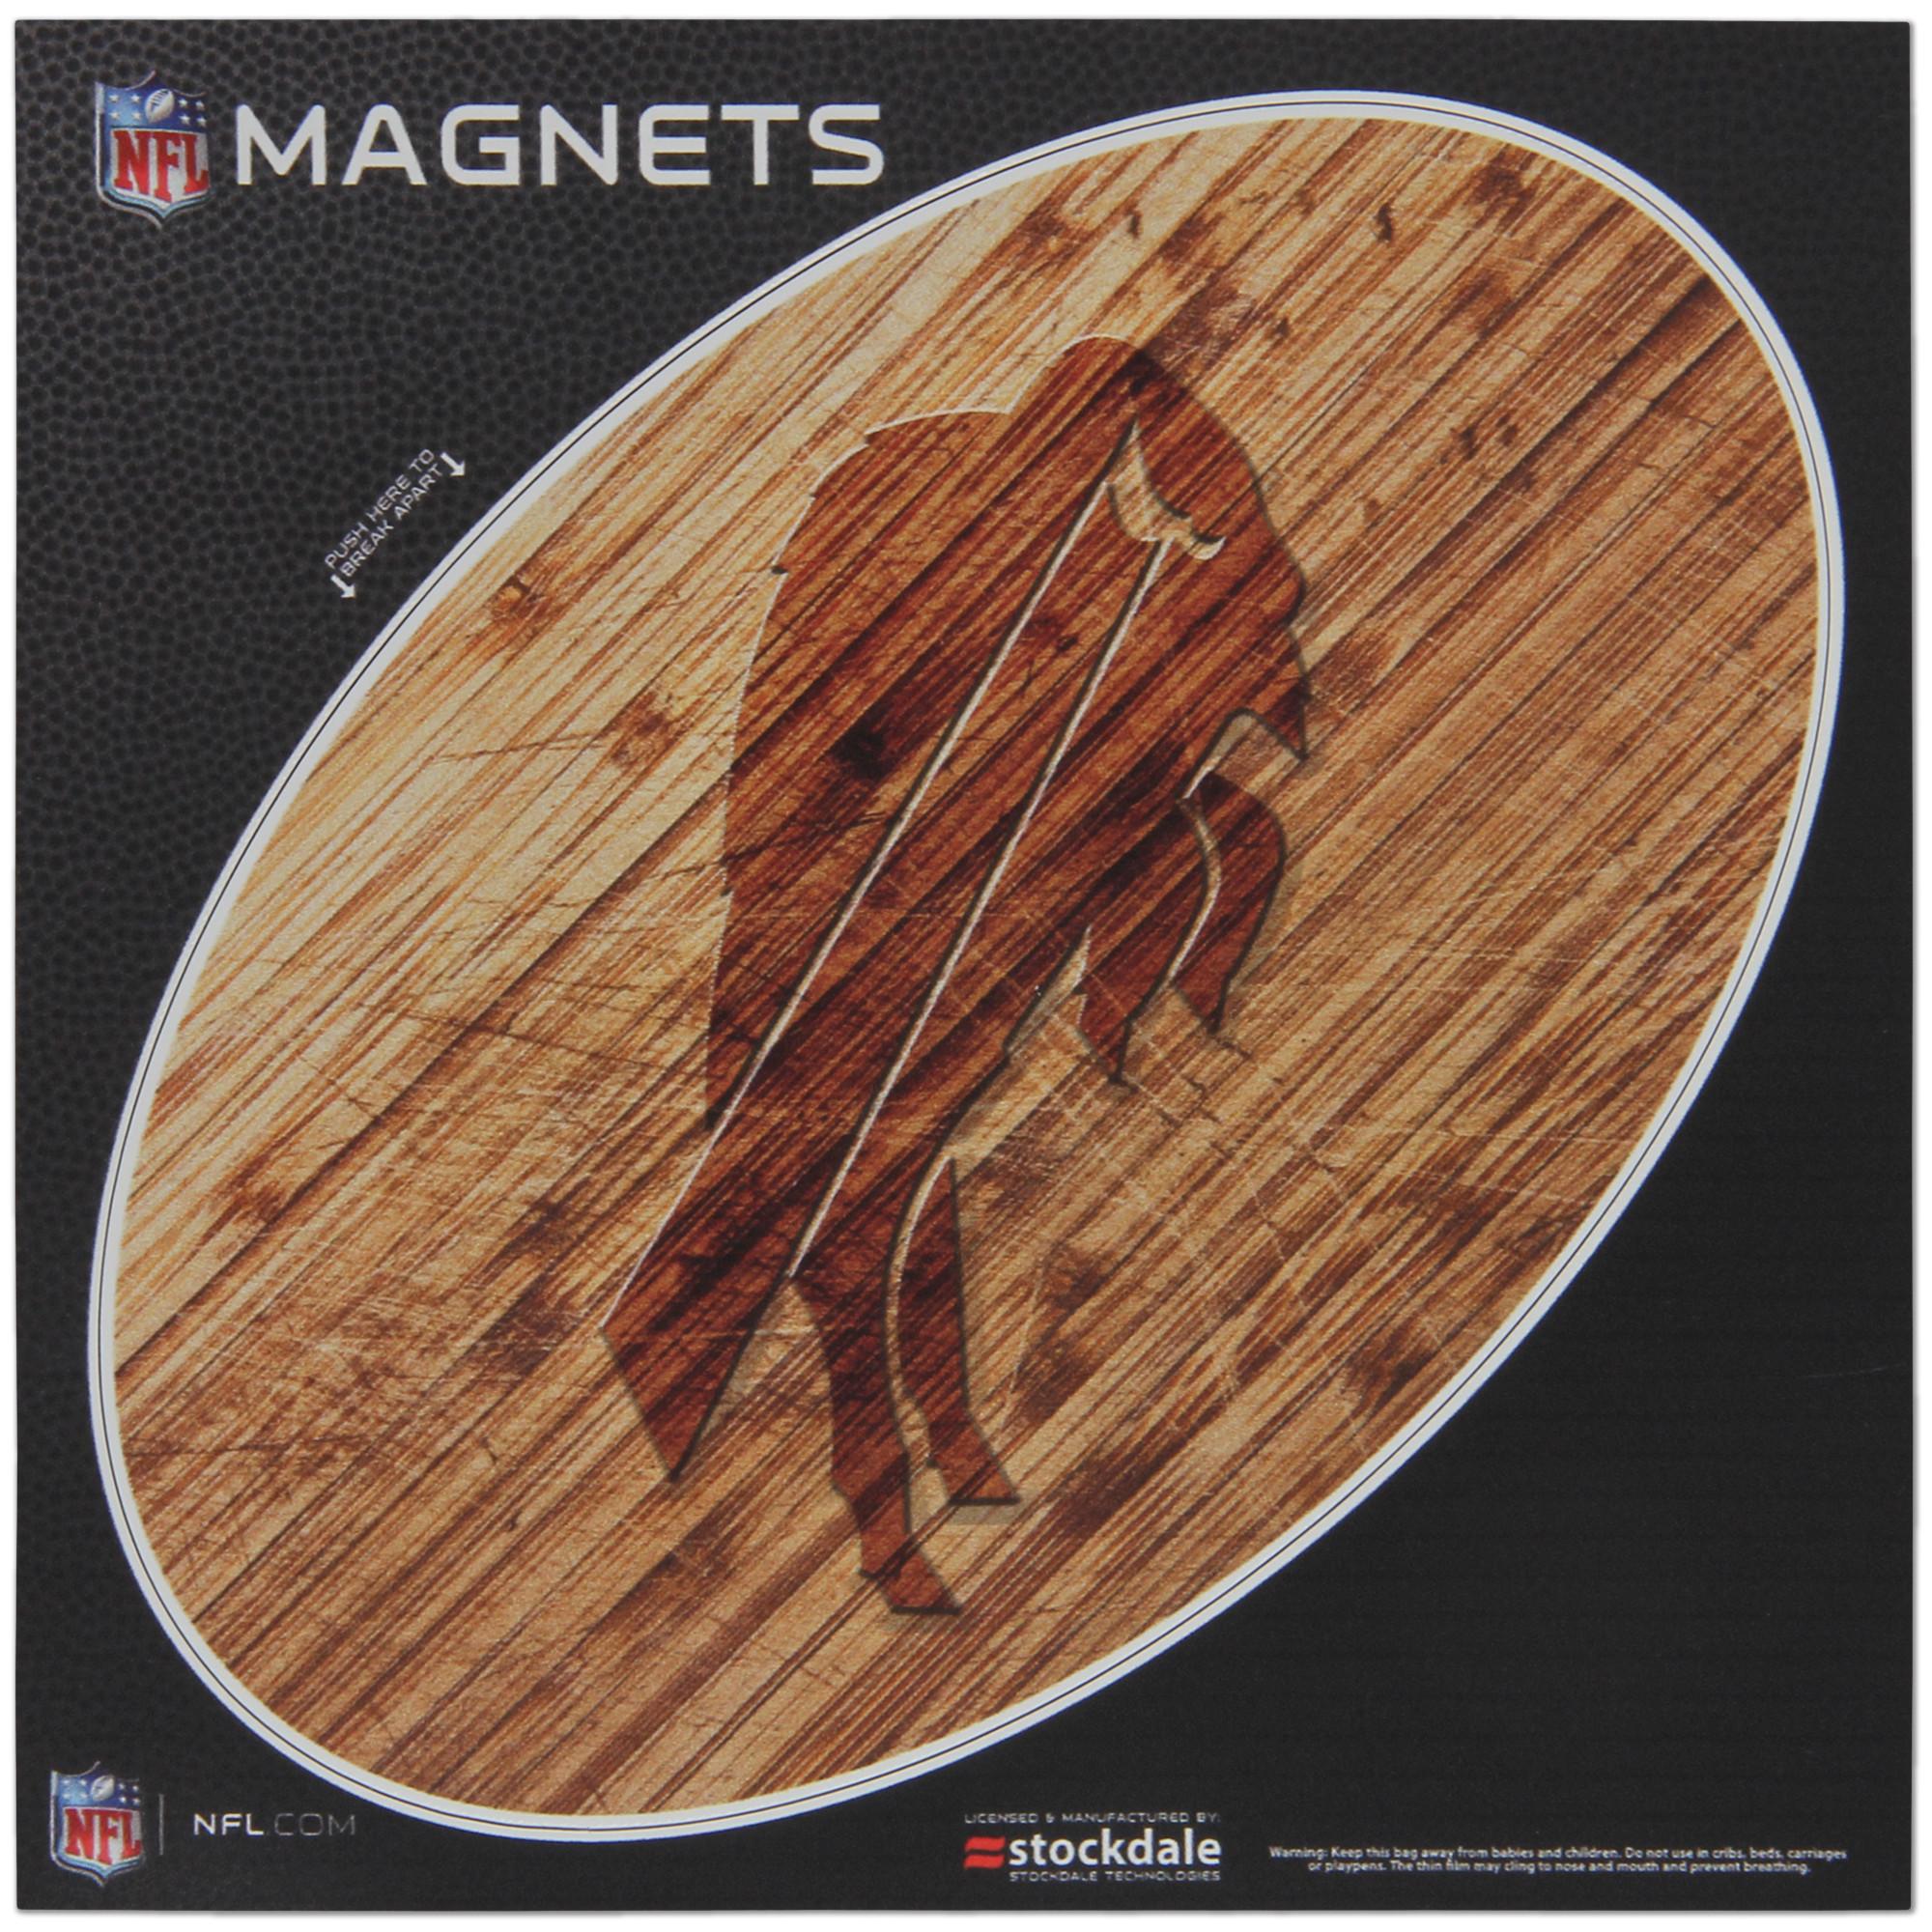 Buffalo Bills 6 x 6 Wood Design Magnet - No Size